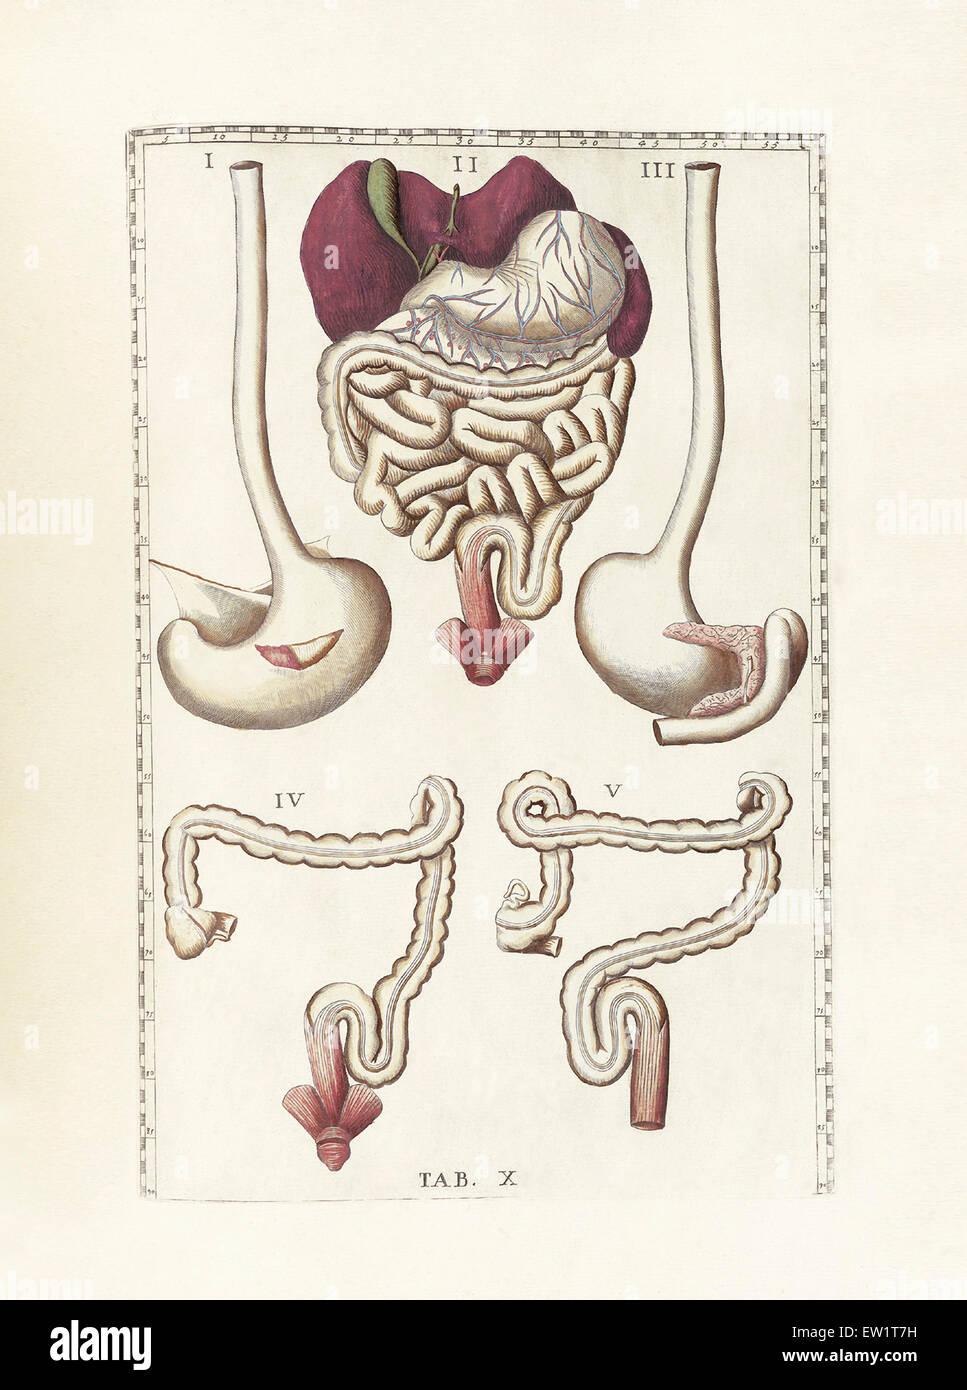 Digestive Small Large Intestine Drawing Stockfotos & Digestive Small ...